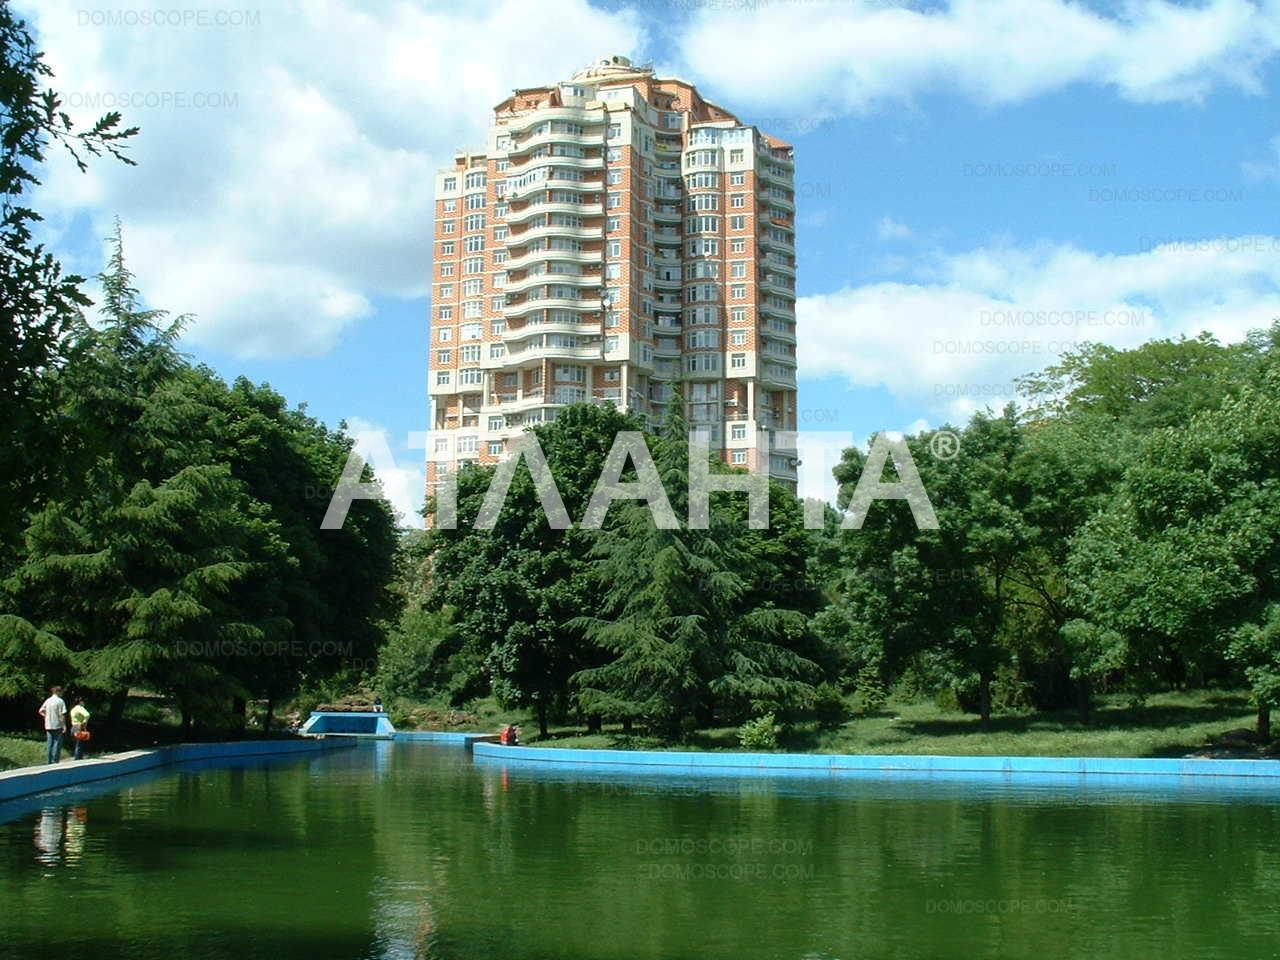 Продается 3-комнатная Квартира на ул. Шевченко Пр. — 144 000 у.е. (фото №2)